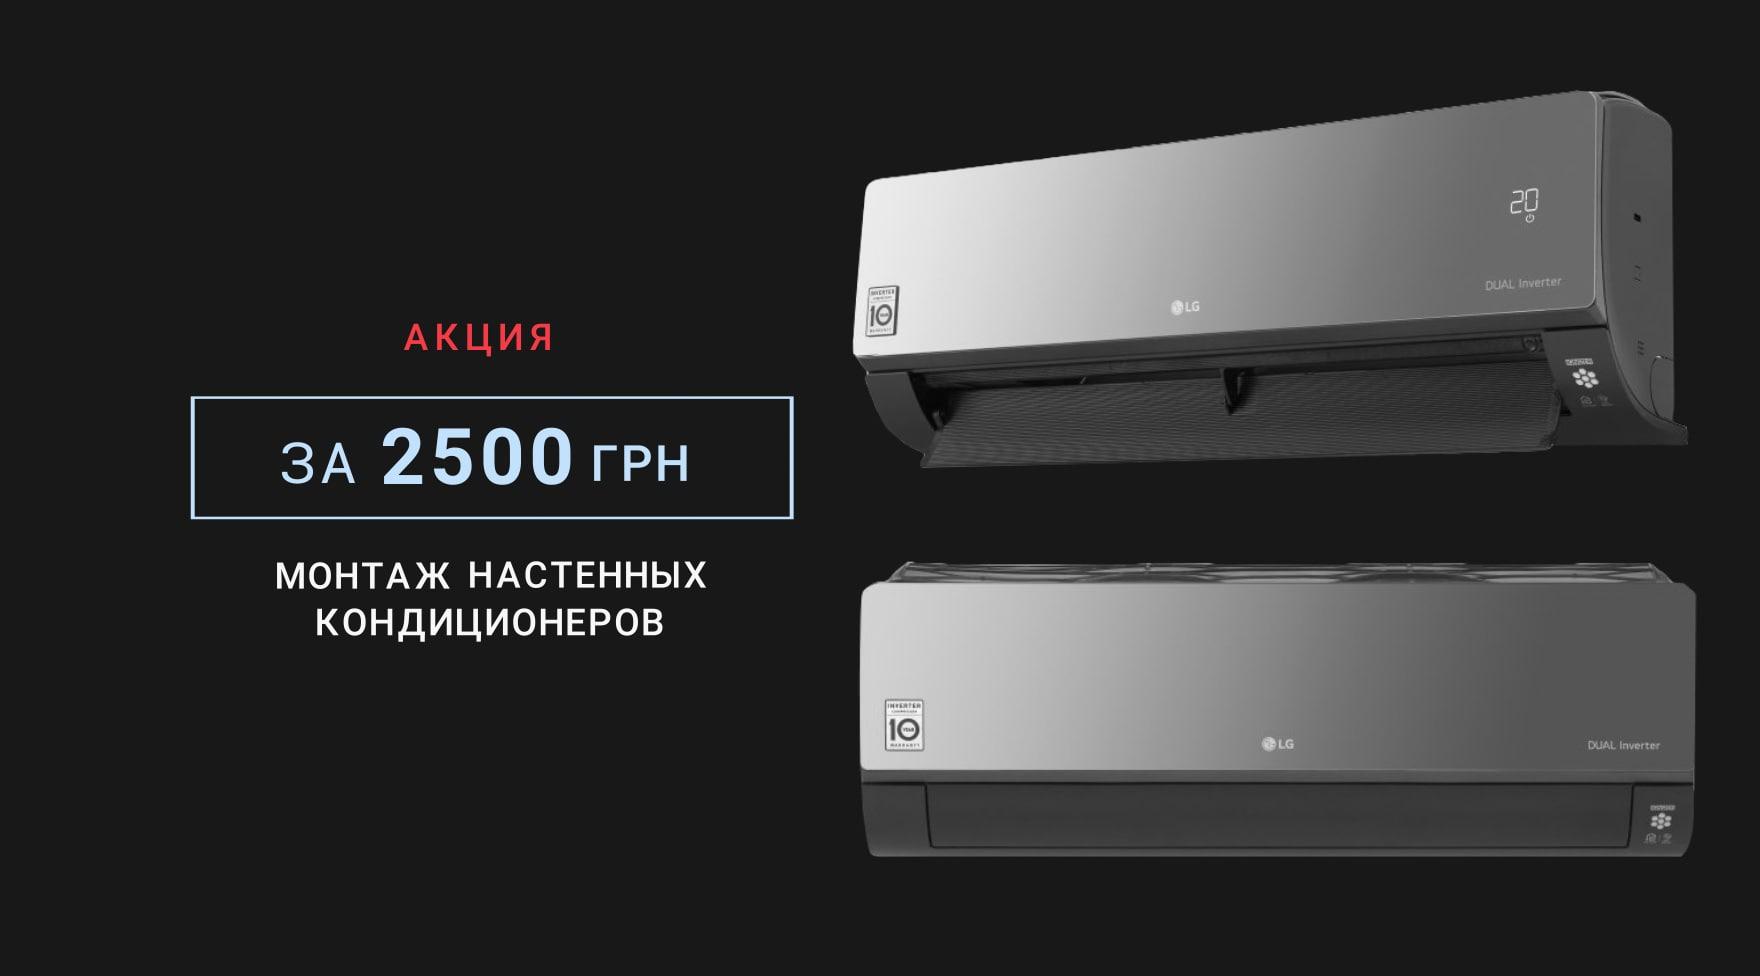 Монтаж настенных кондиционеров за 2500 грн.